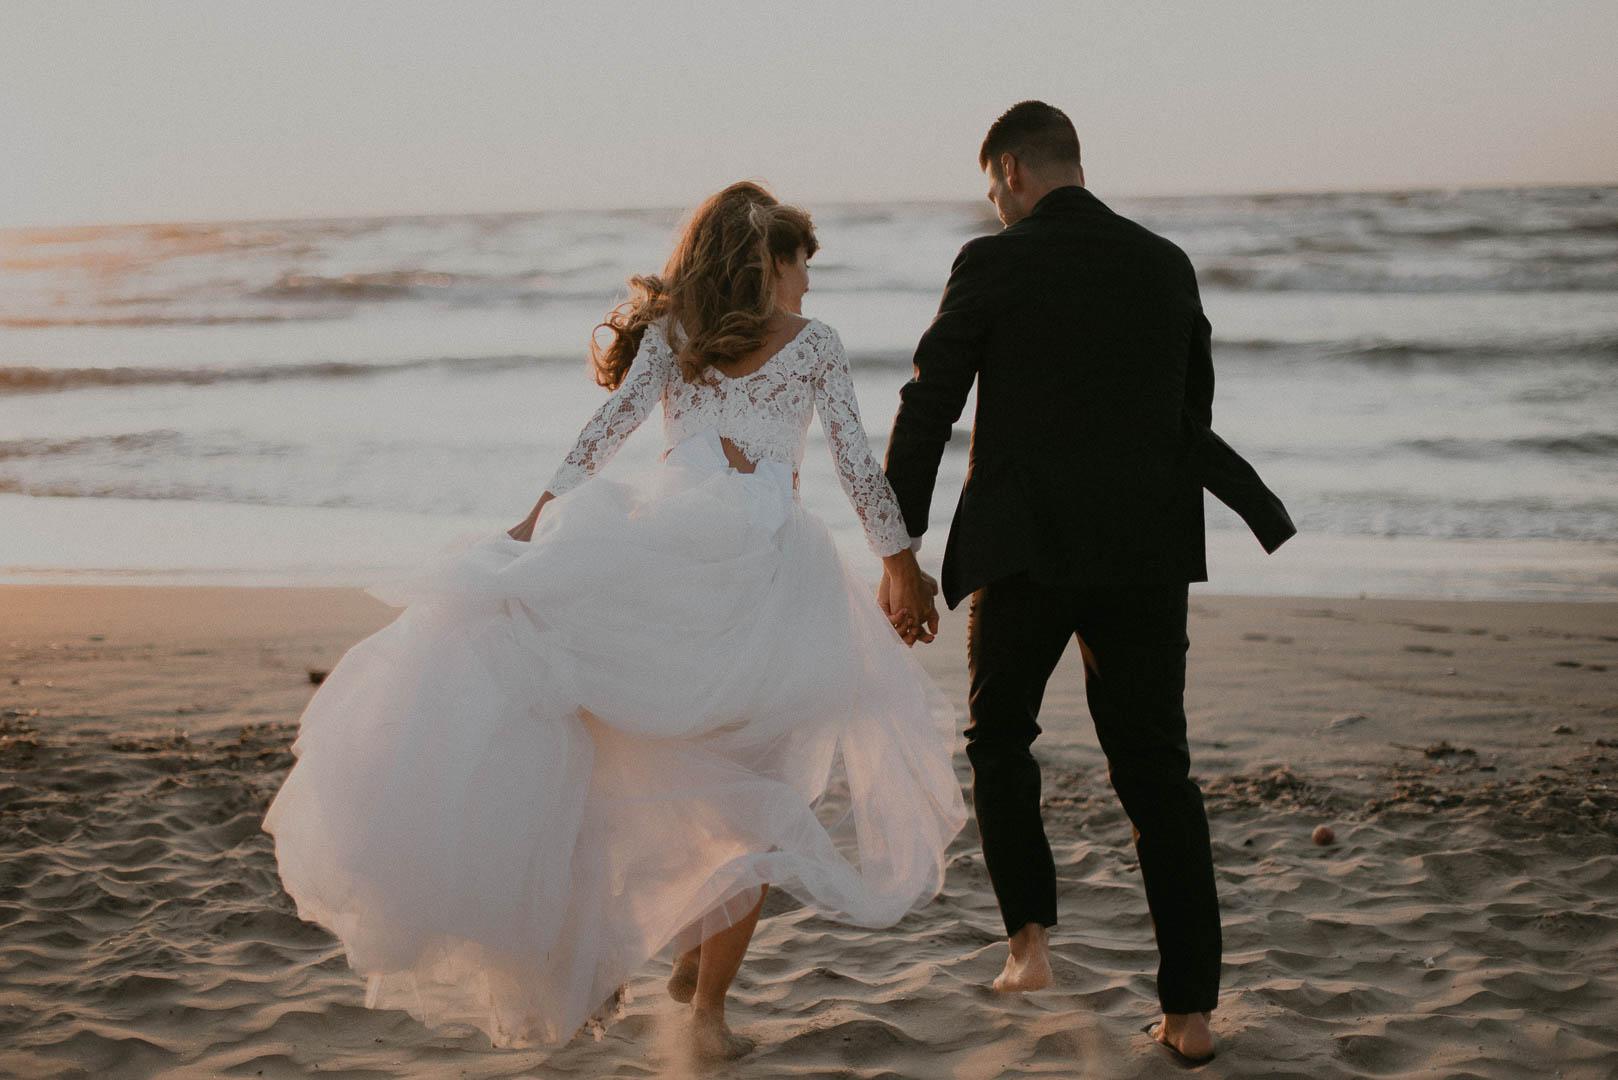 wedding-photographer-destination-fineart-bespoke-reportage-napoli-nabilah-vivianeizzo-spazio46-114